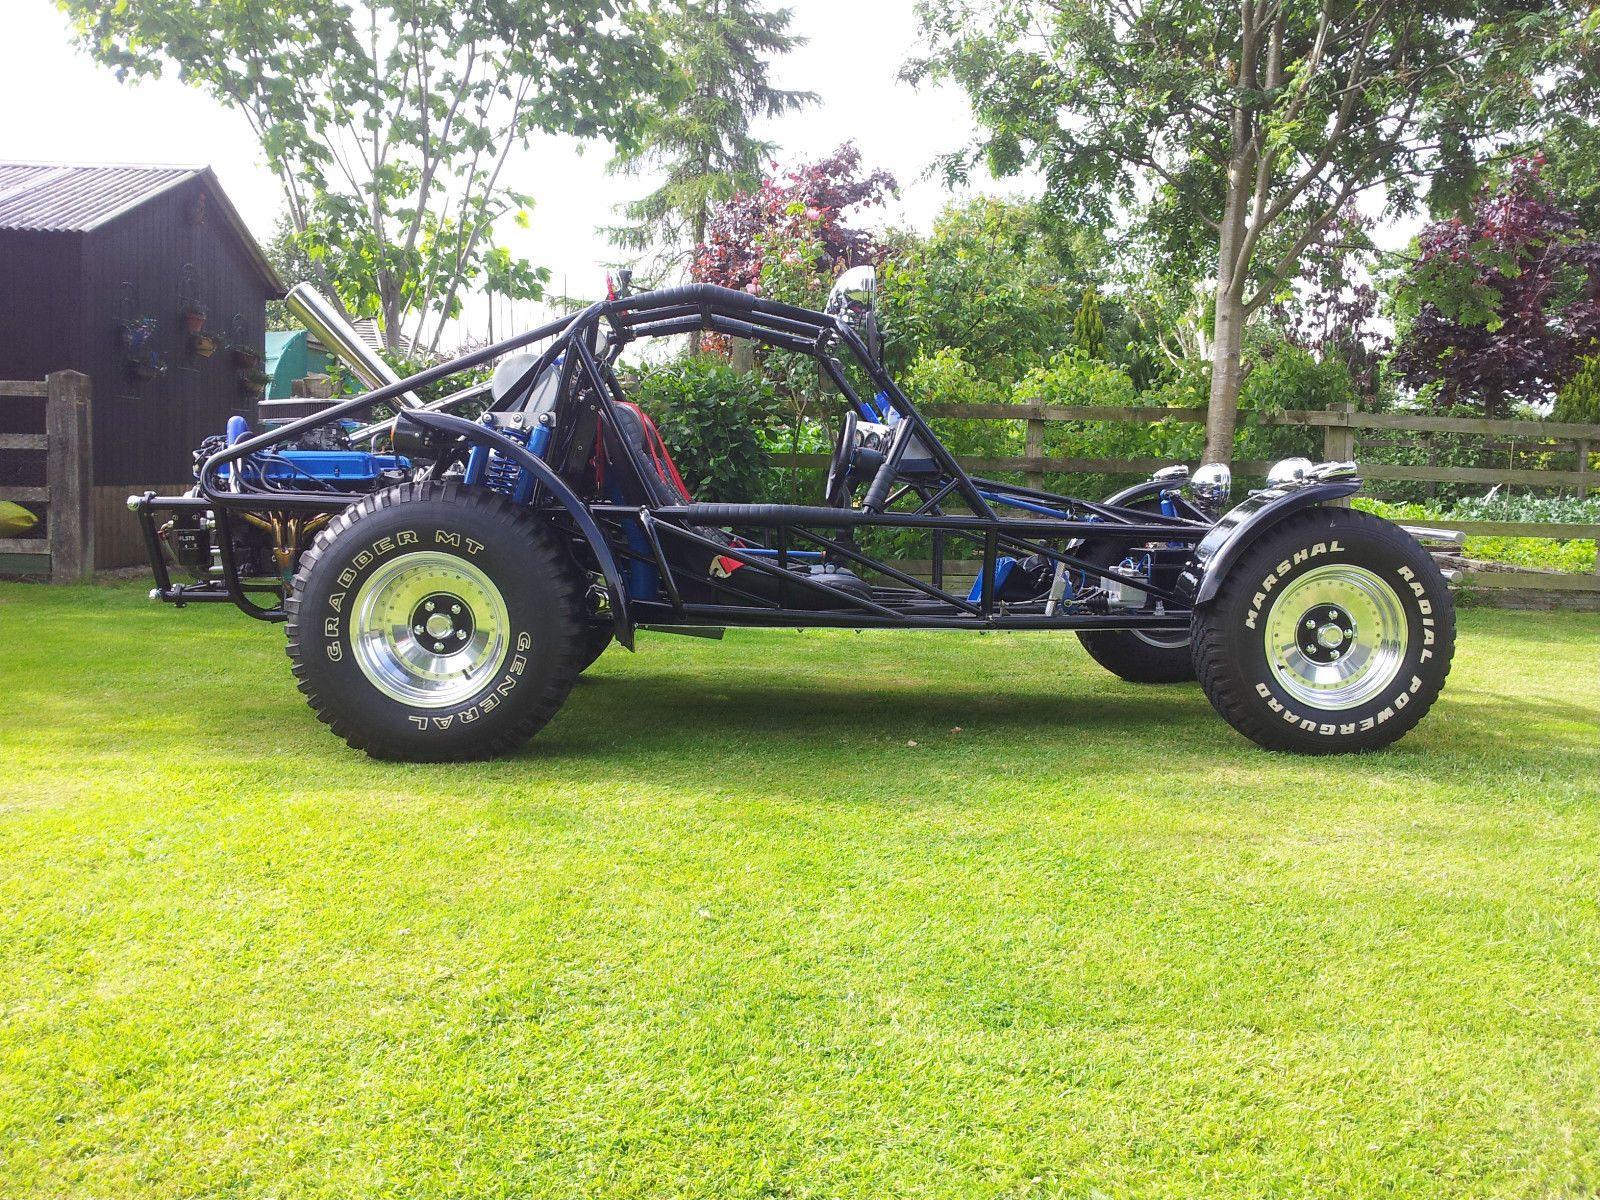 Chenowth v8 sand rail buggy hotrod custom show mint tax exempt px ...